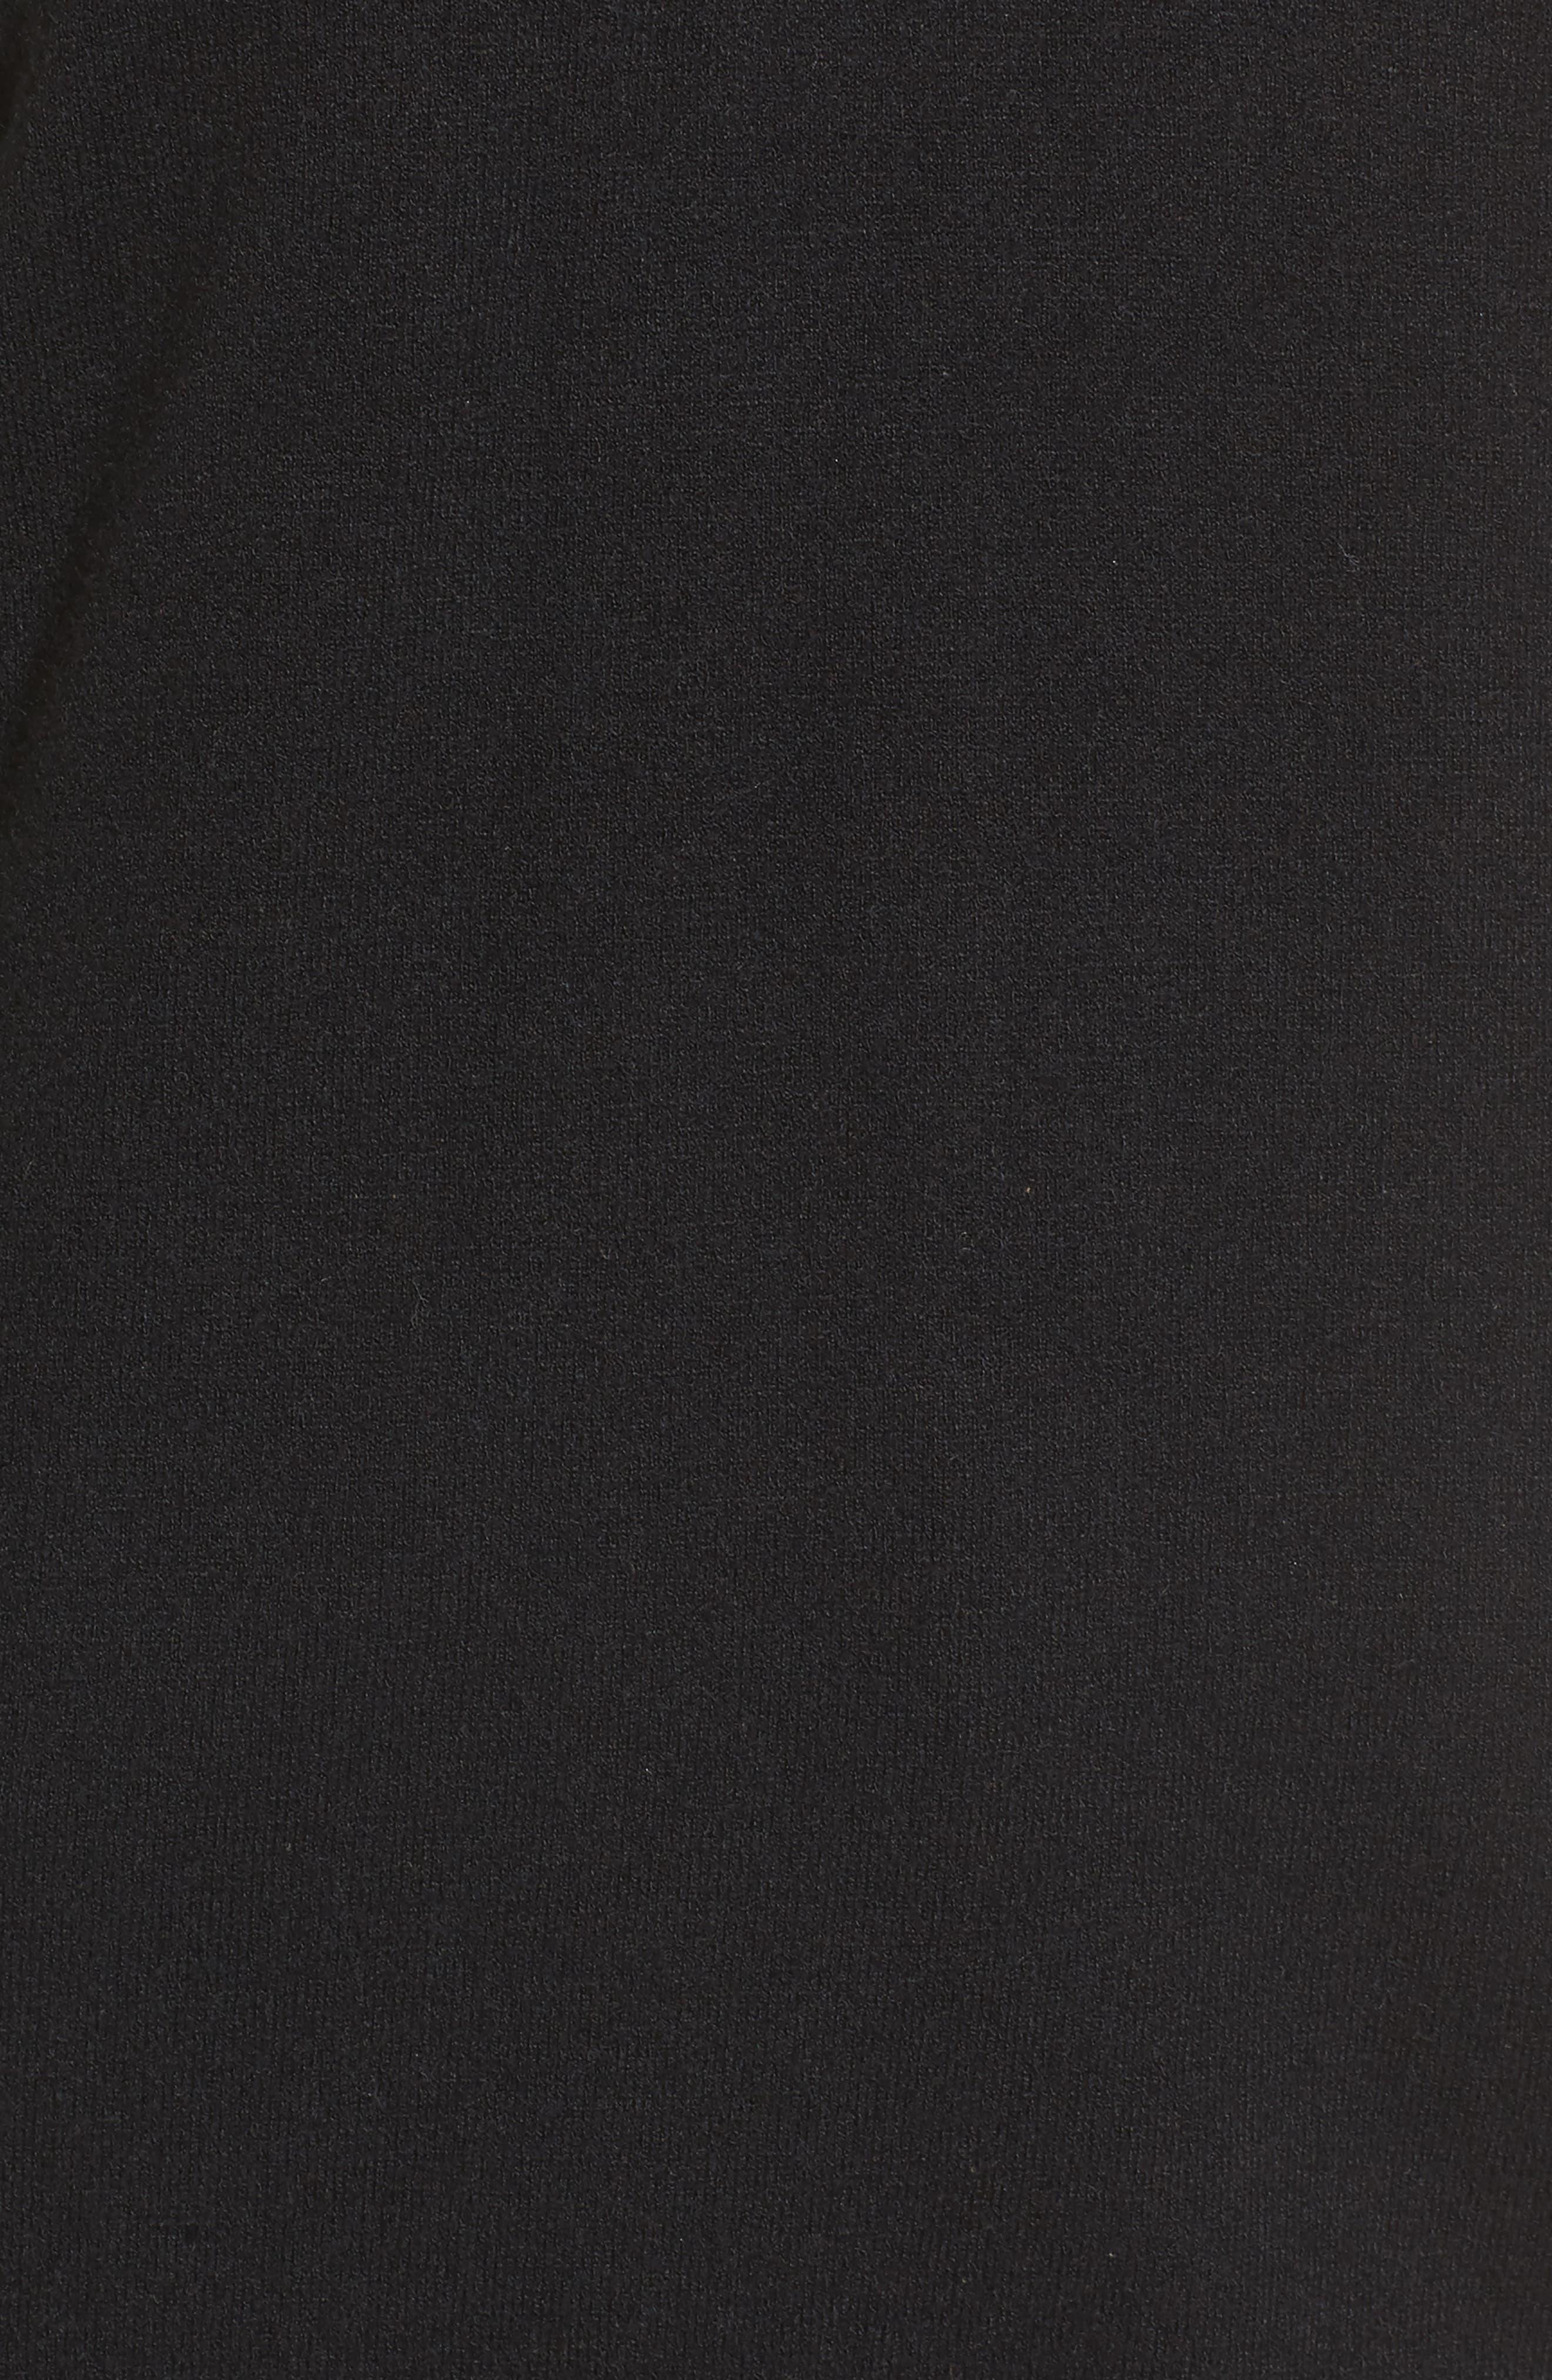 Cutout Detail Sweater,                             Alternate thumbnail 5, color,                             001